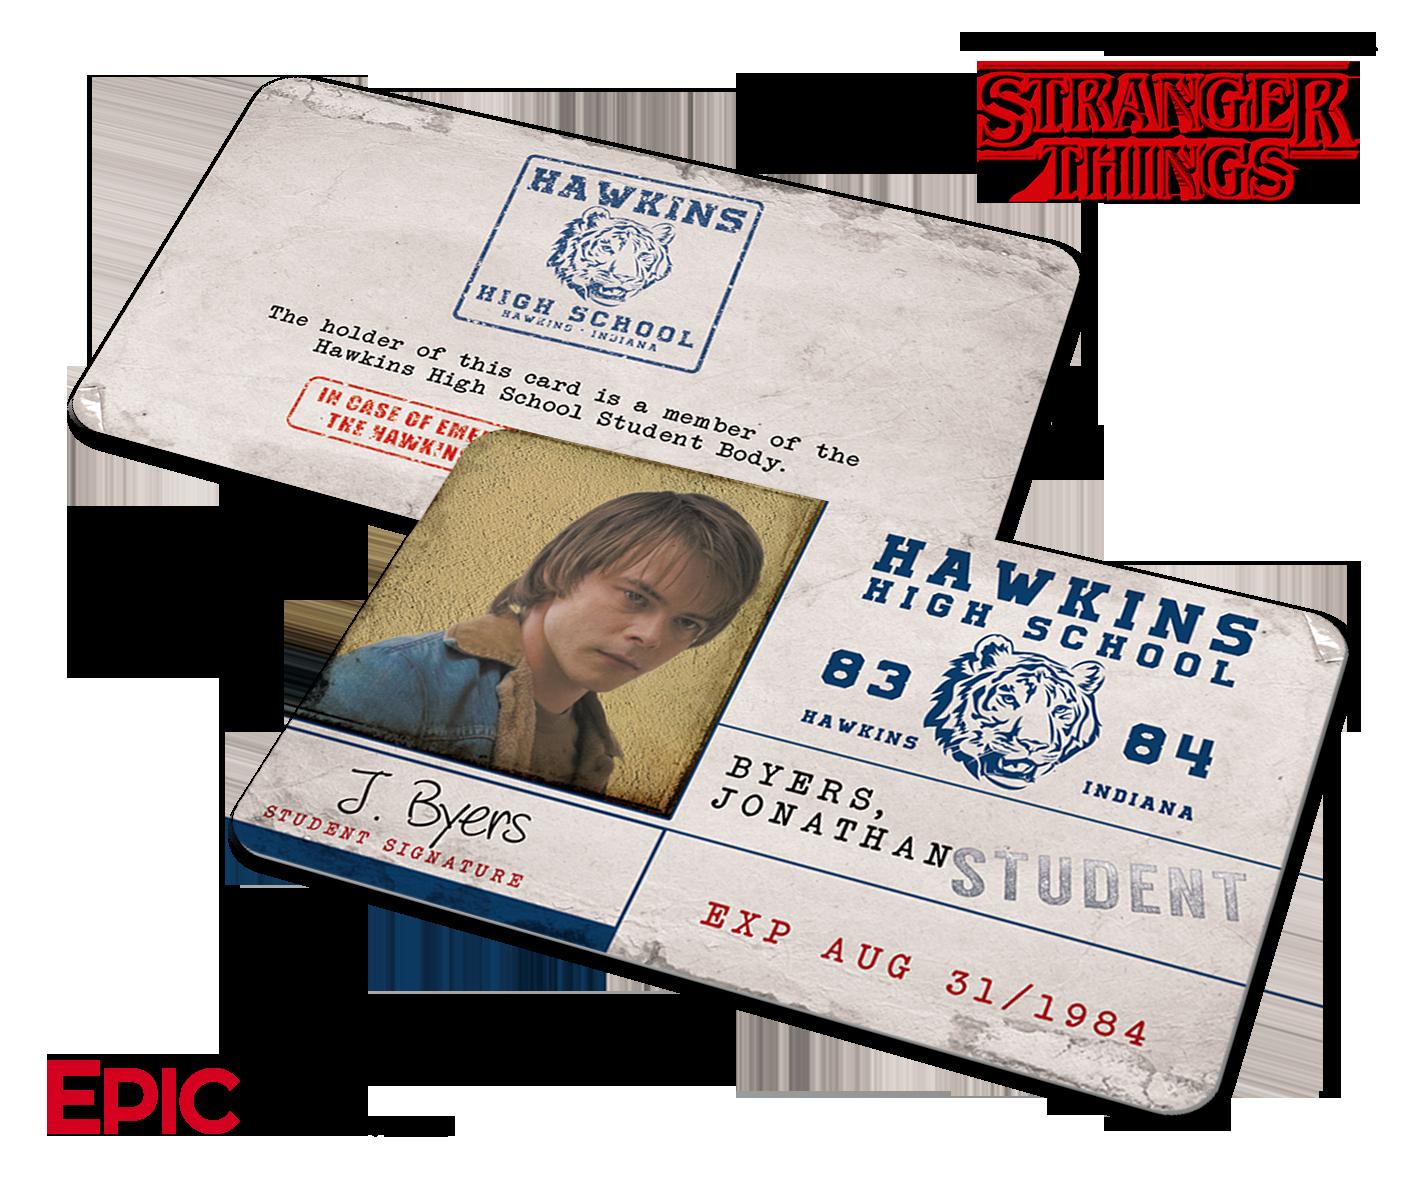 High School Id Card Template Fresh Hawkins High School Stranger Things Student Id Card